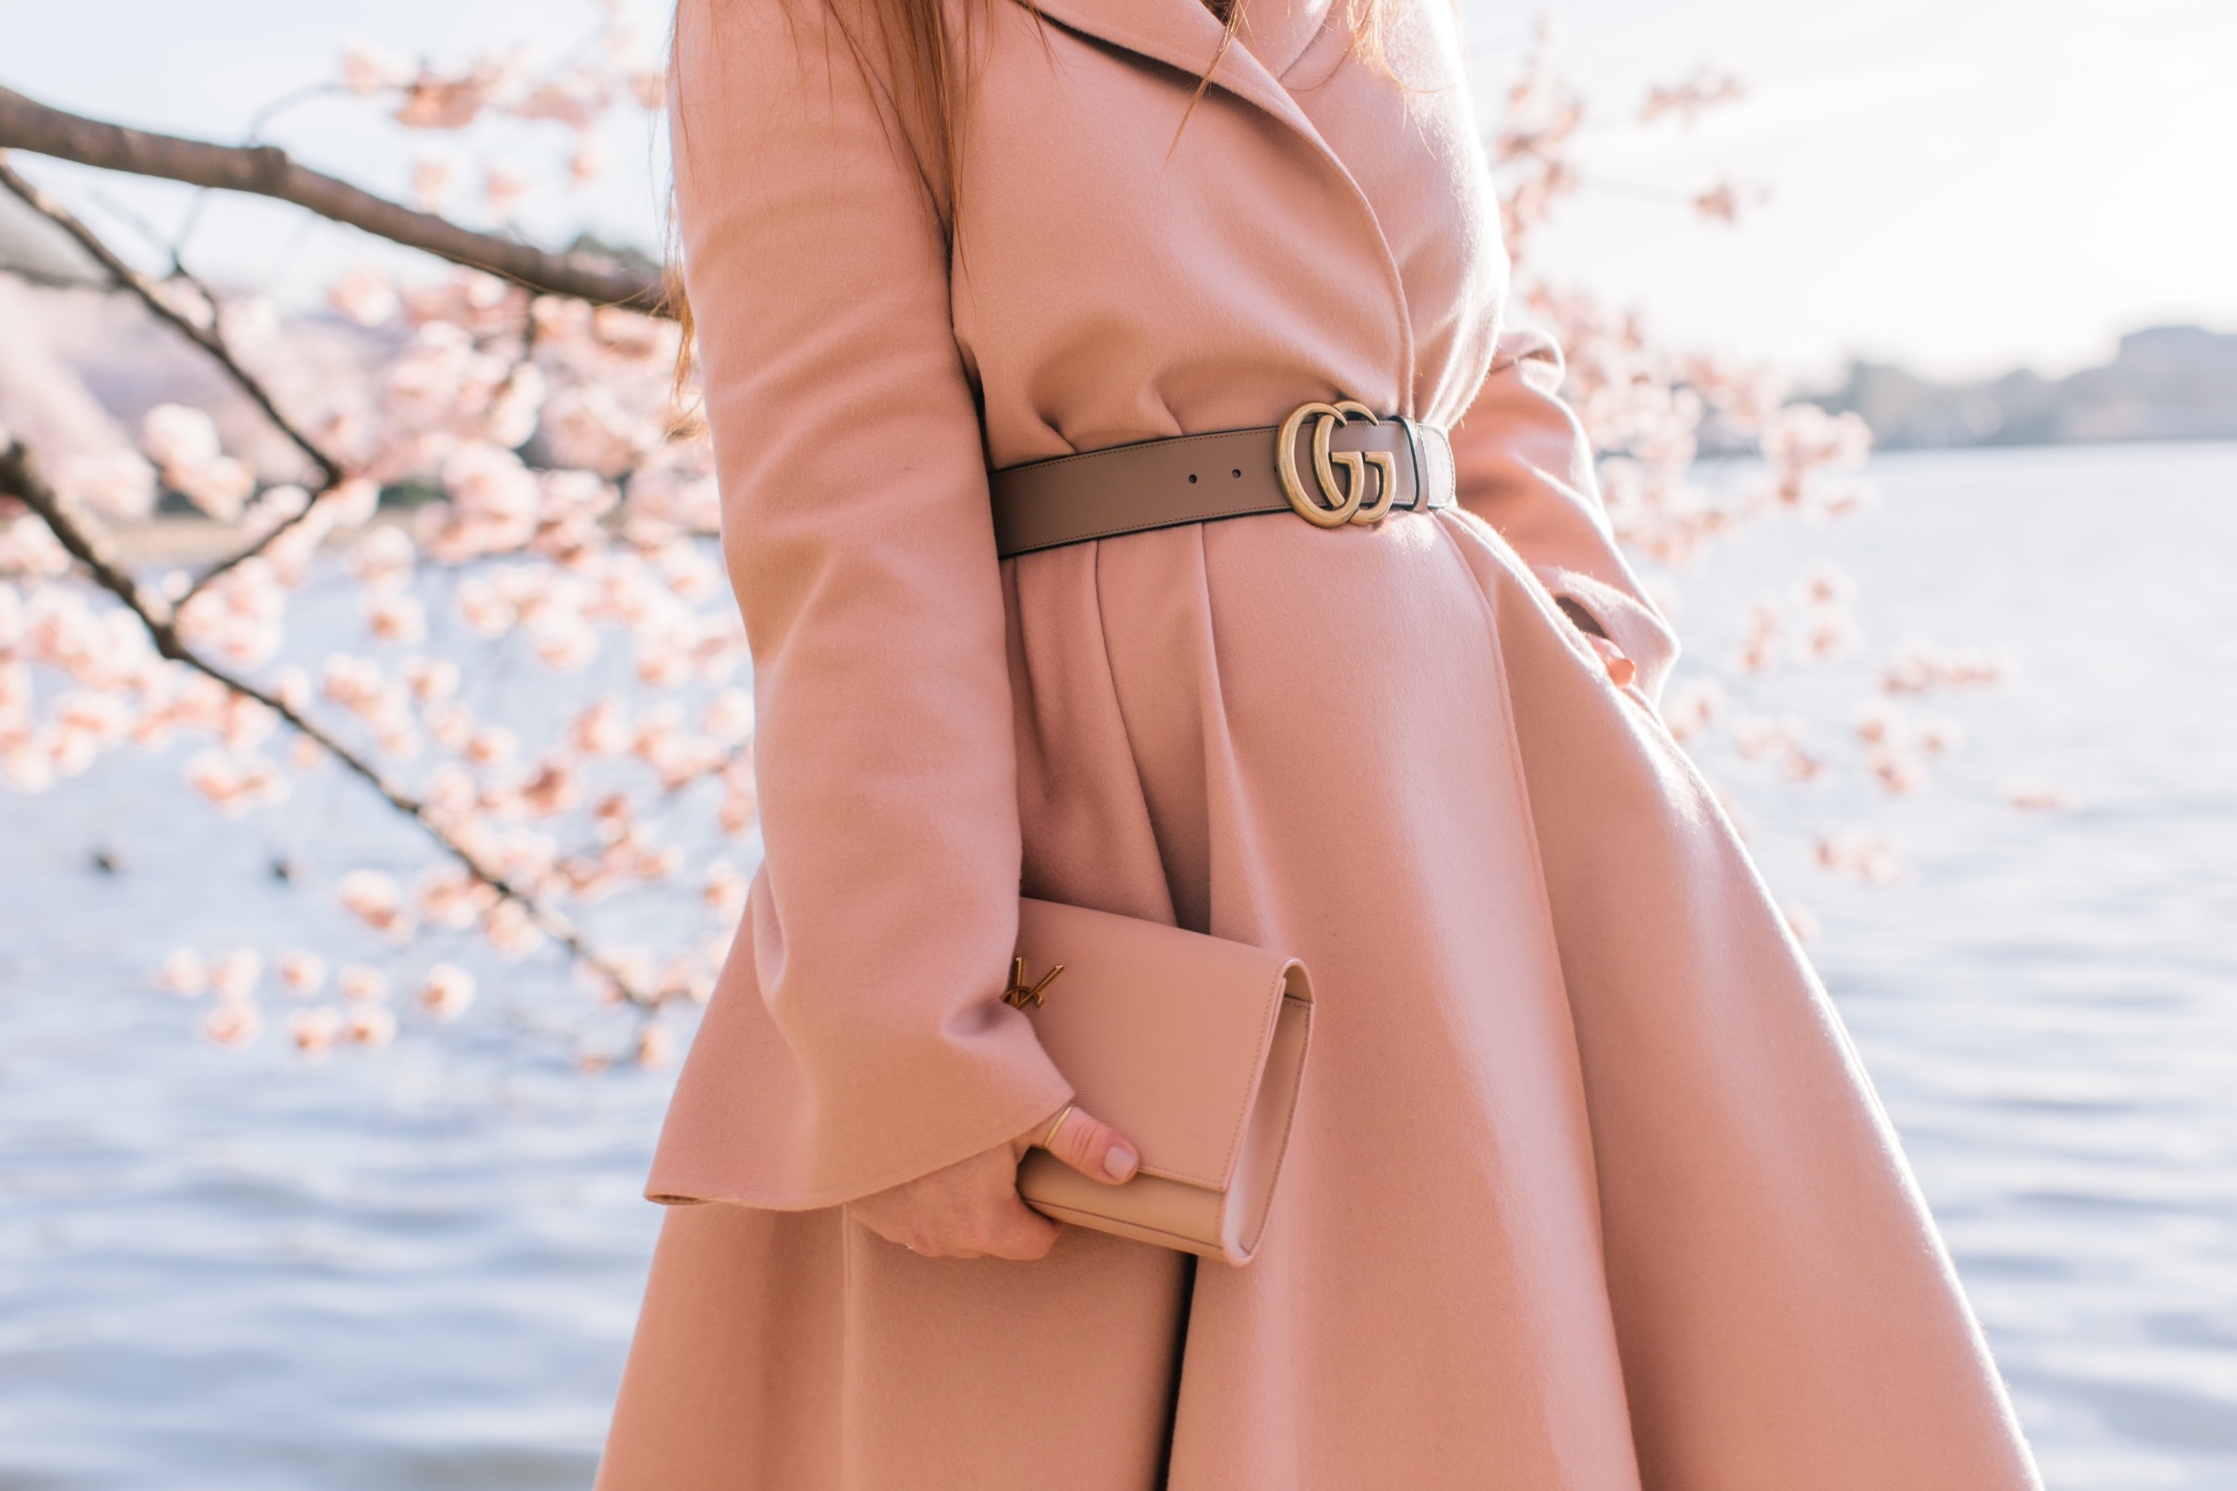 dc_cherry_blossoms-6.JPG